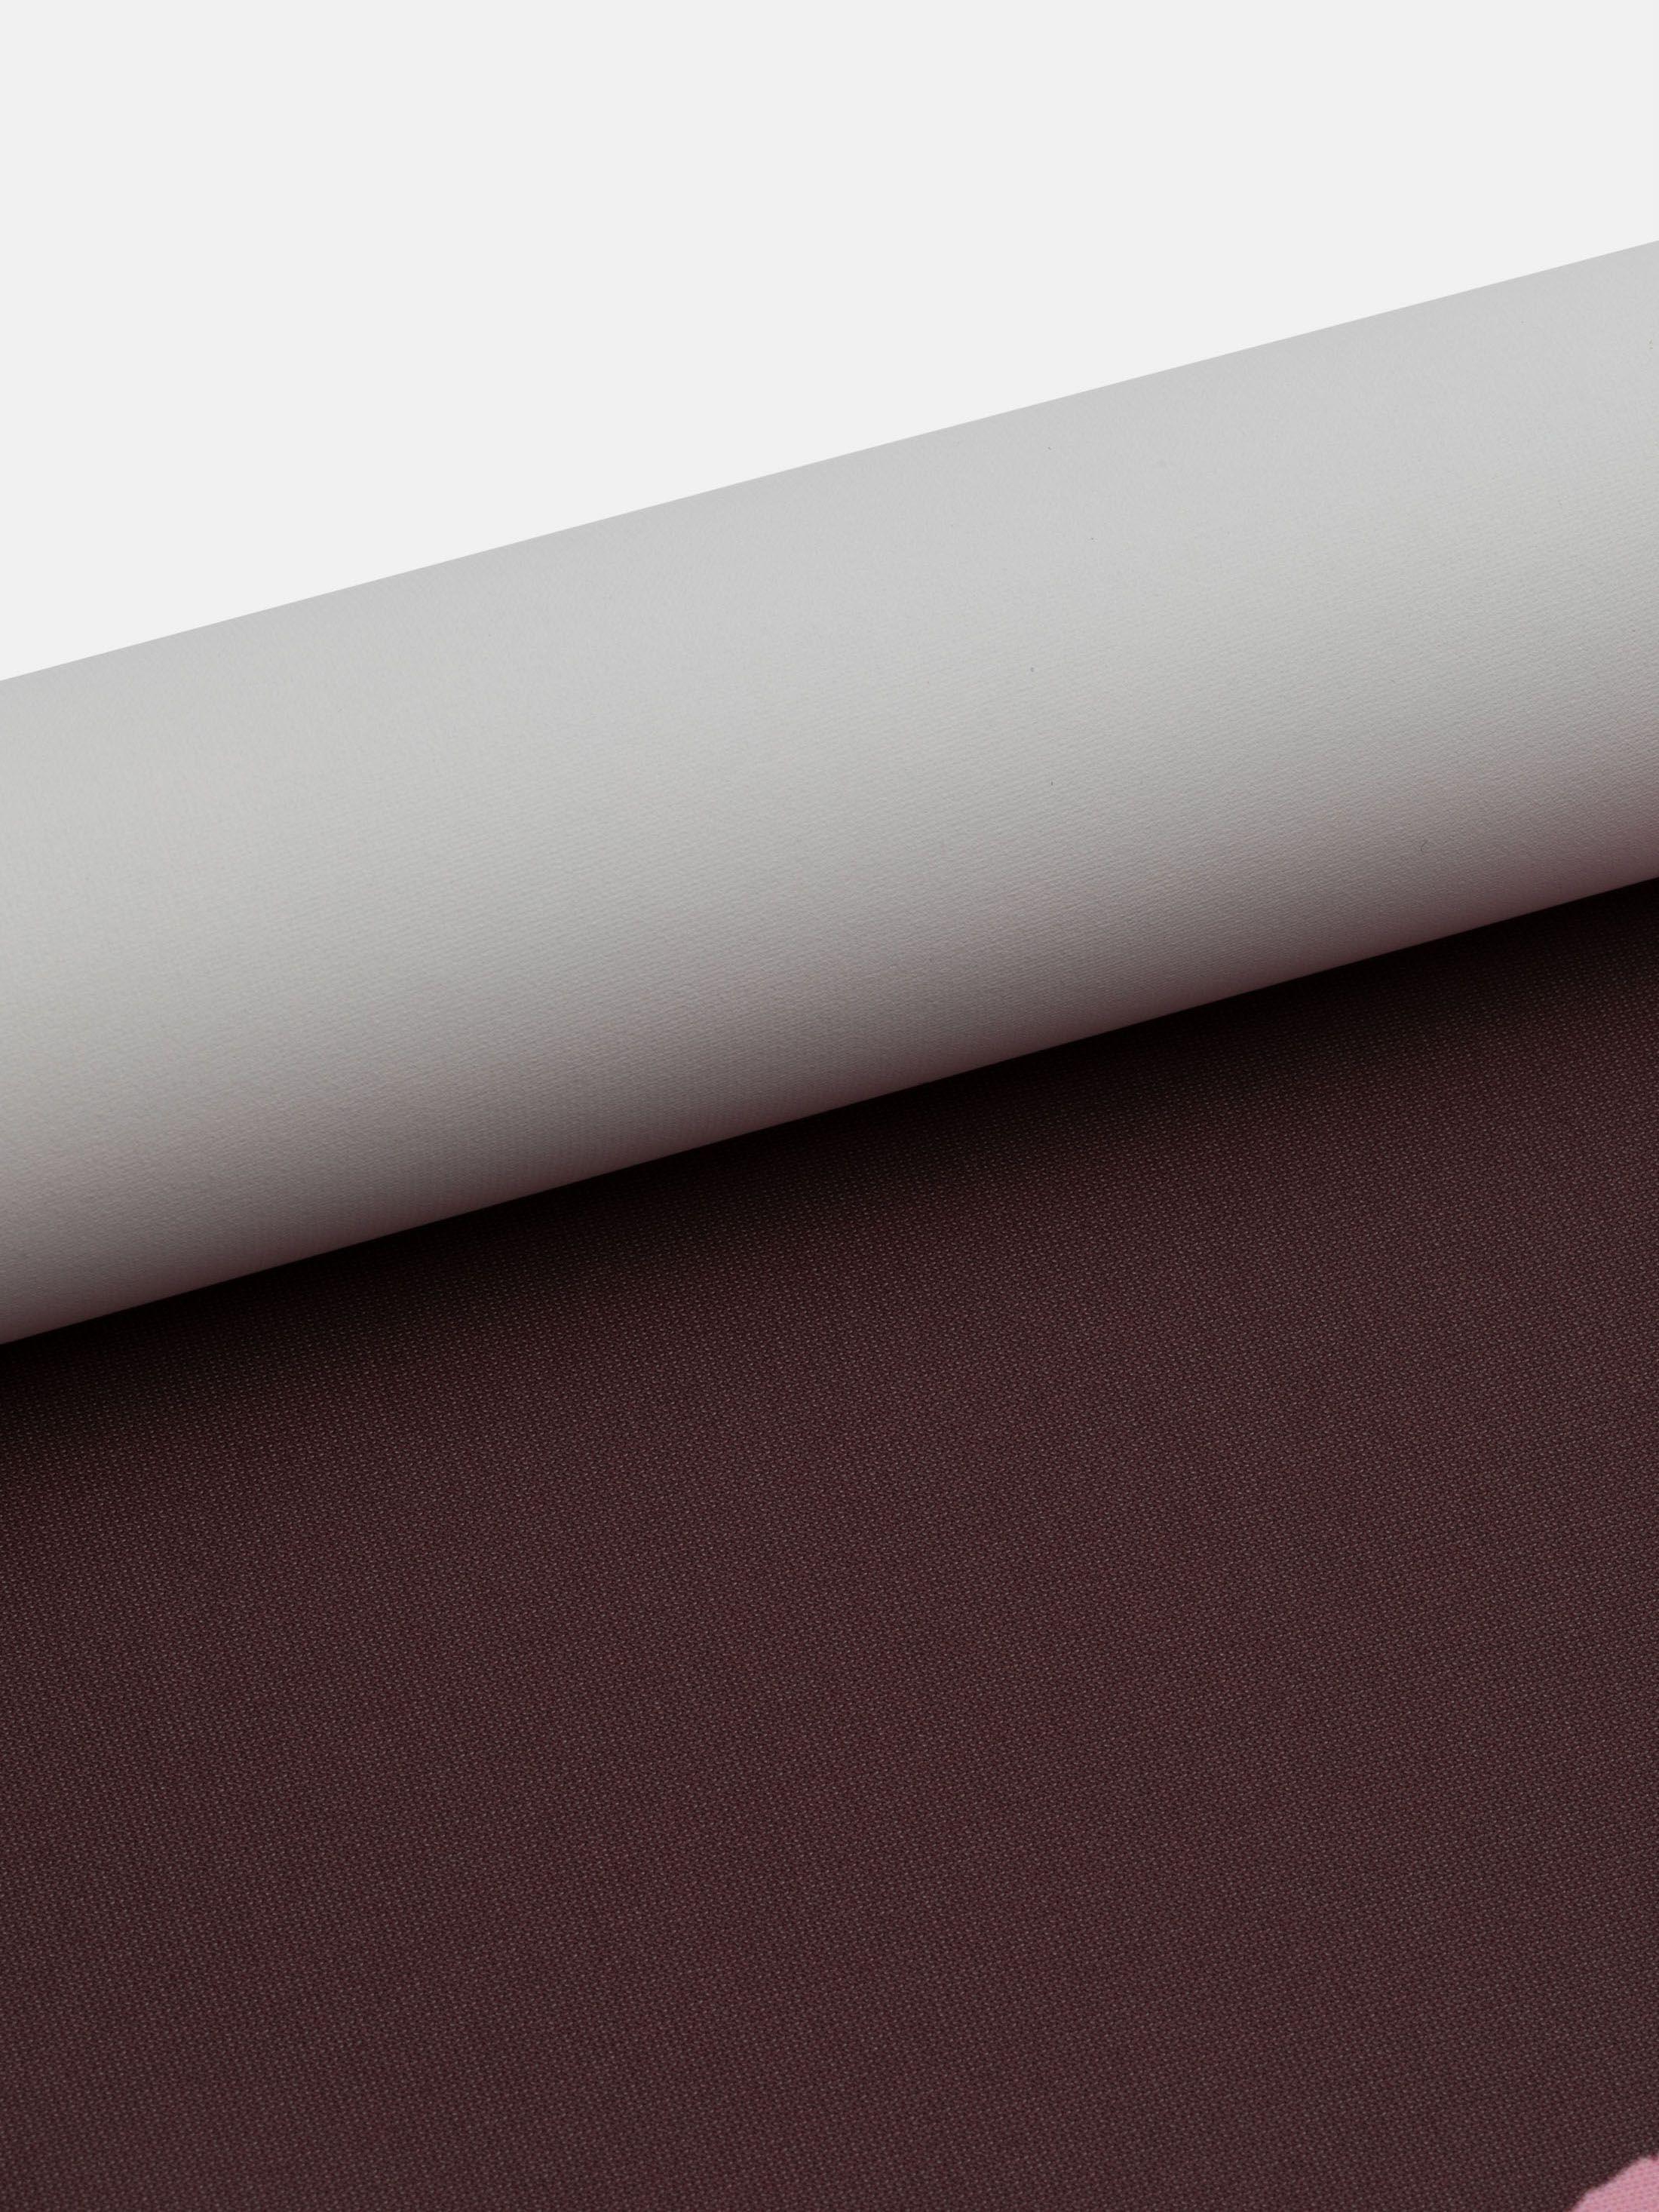 custom roller blinds cord details